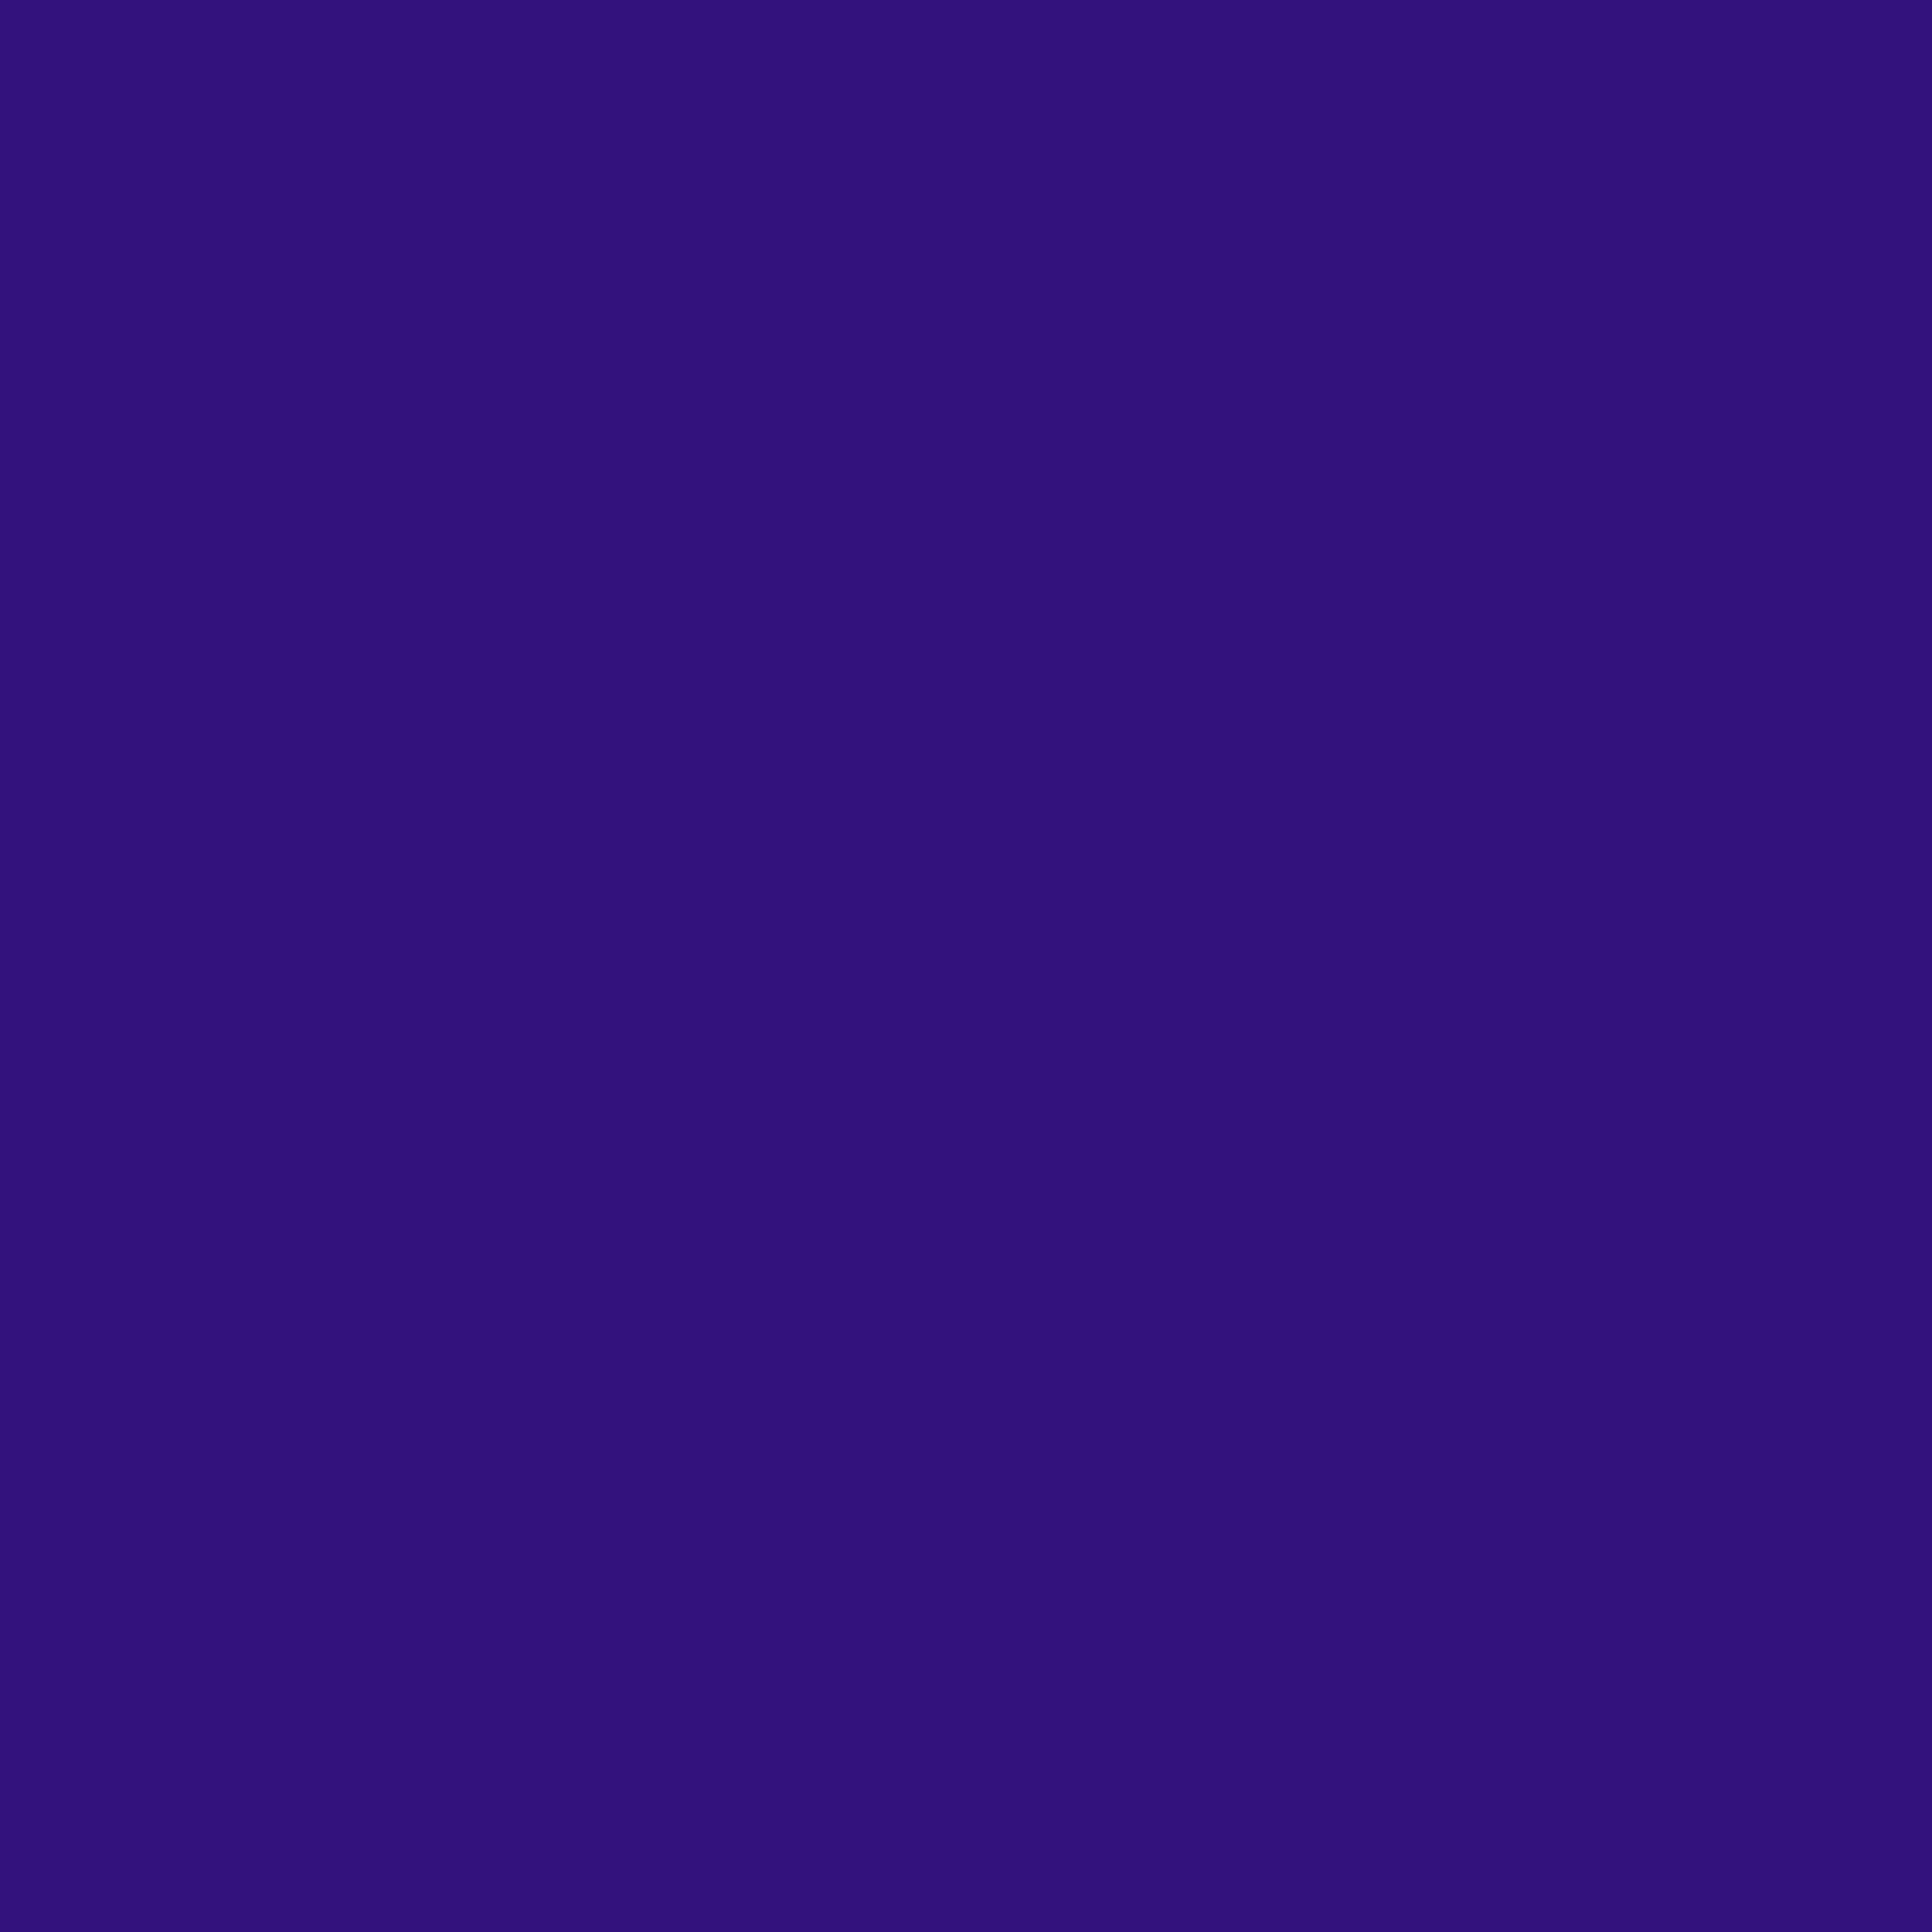 3600x3600 Persian Indigo Solid Color Background